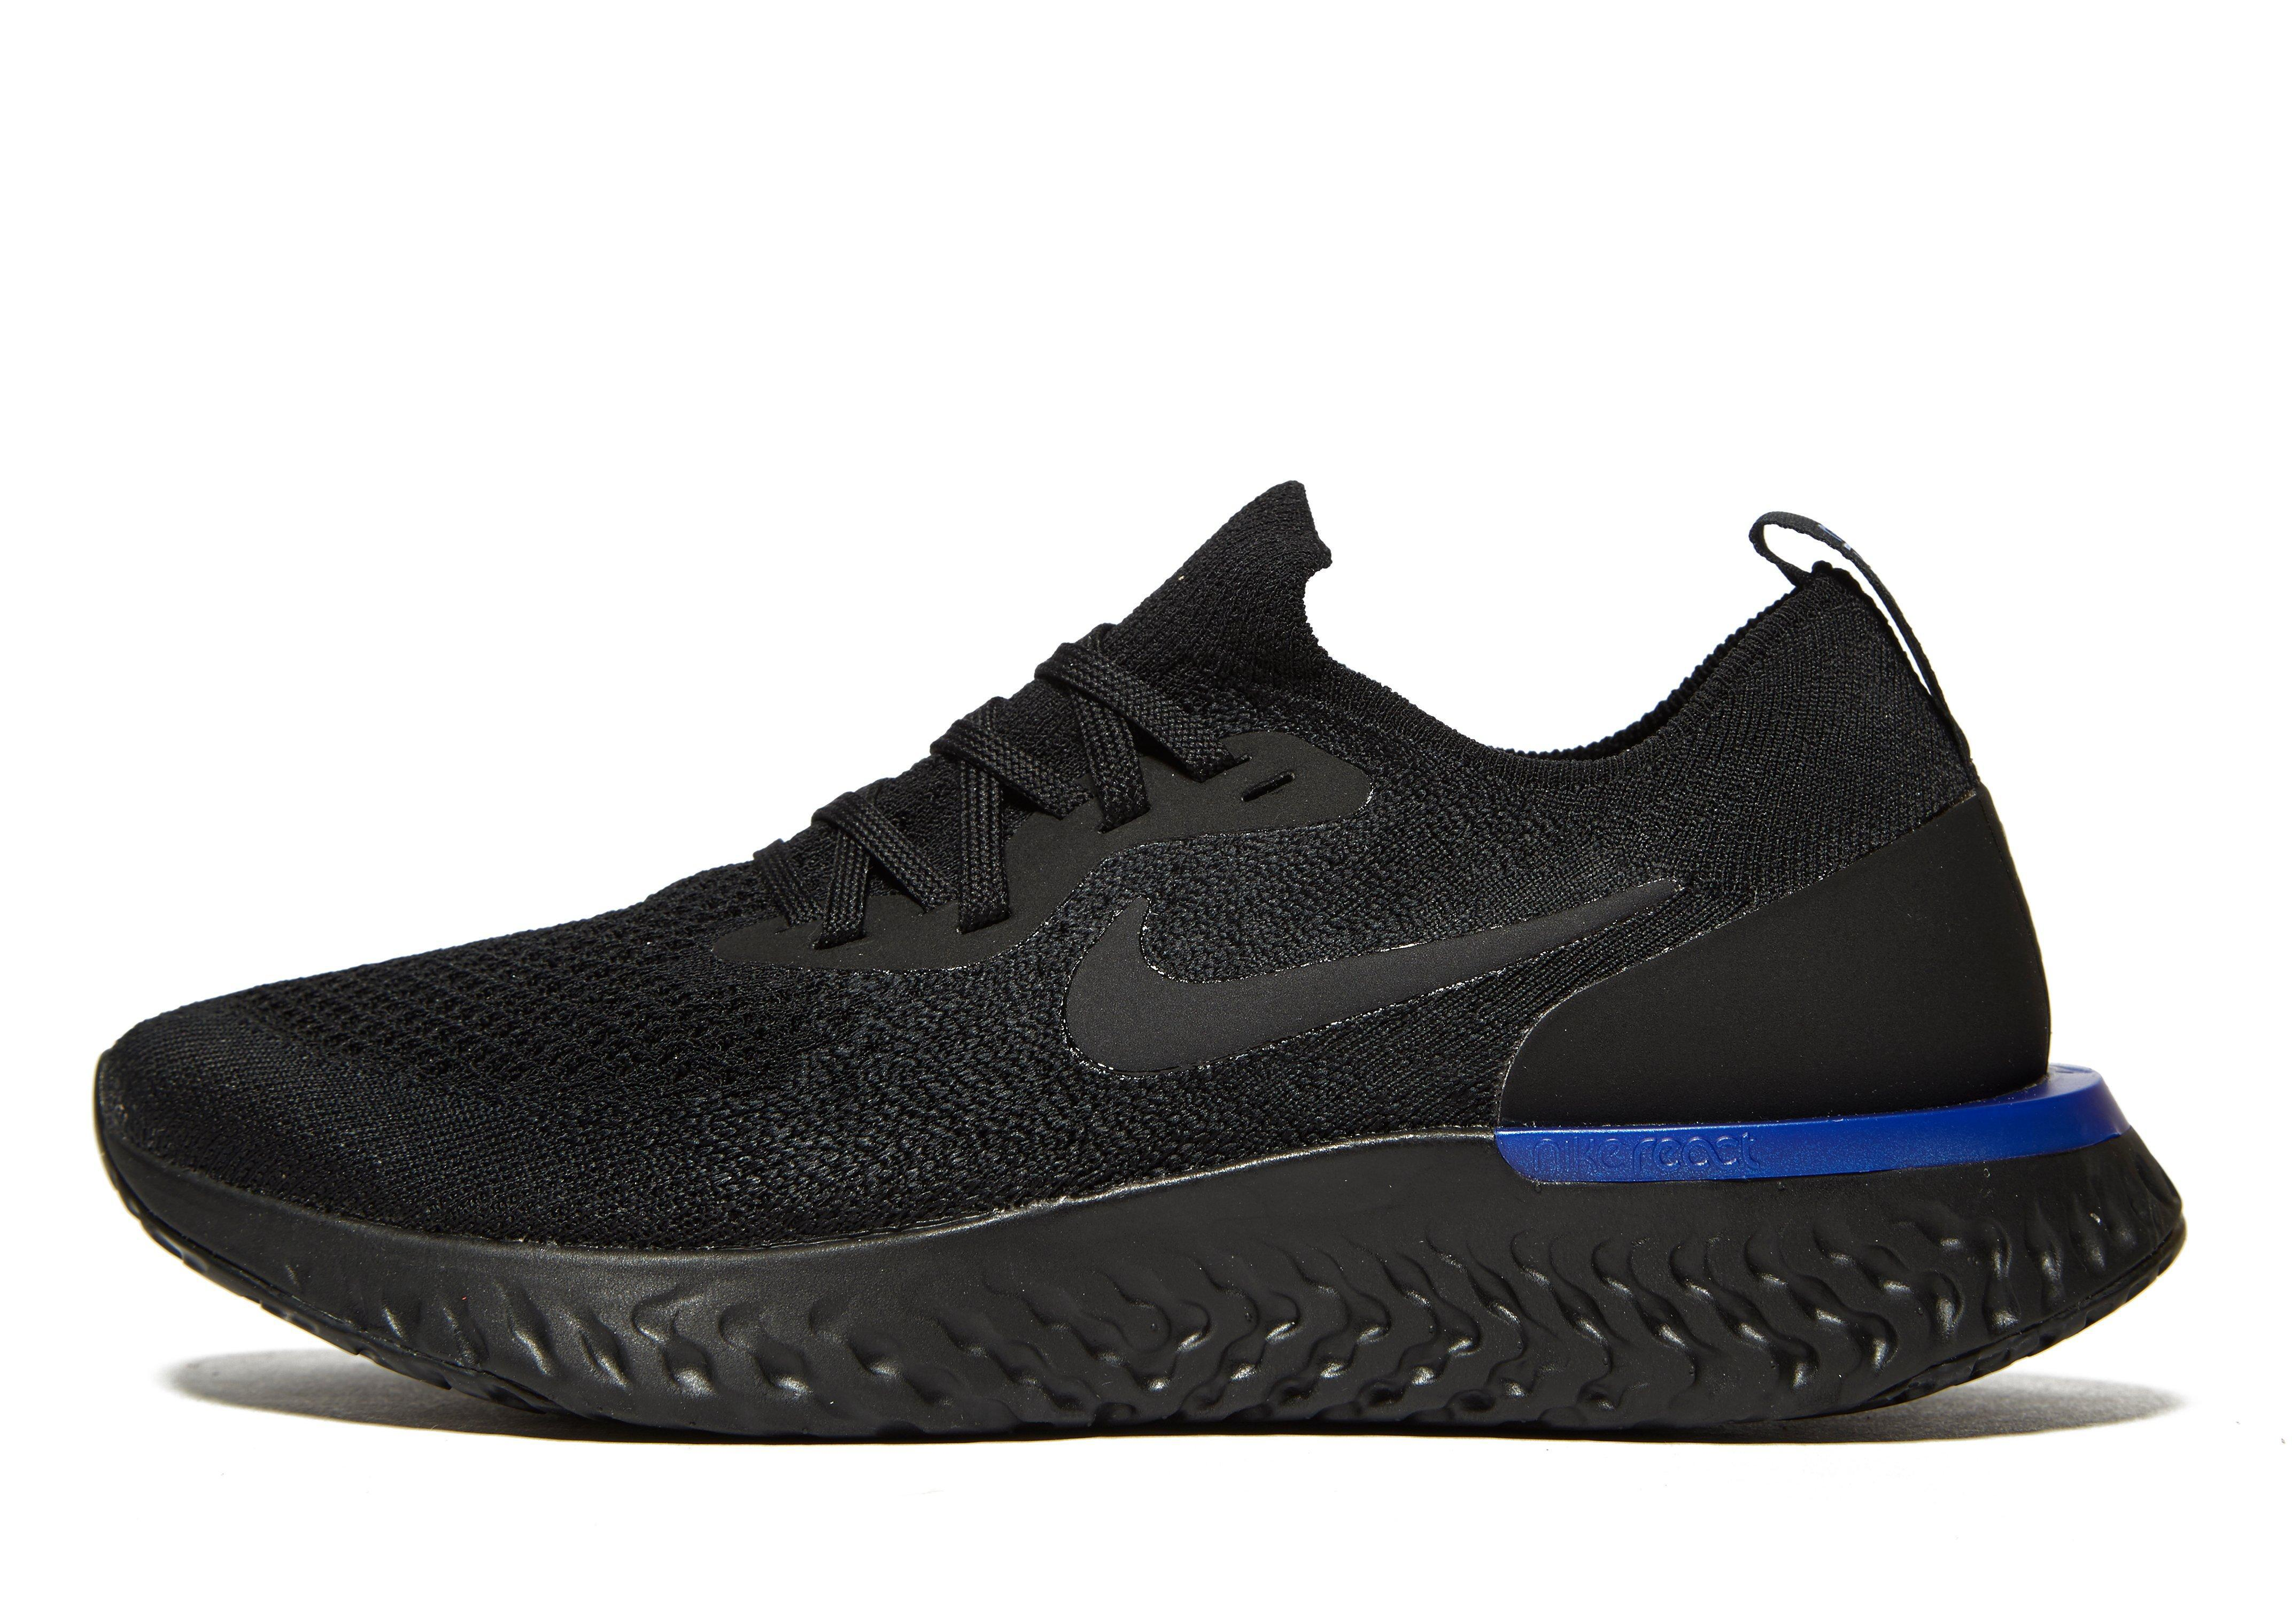 best sneakers 2deb6 44a07 ... Running Shoes 698182 800 698182 FLYKNIT LUNAR 3 Nike. Mens Black Epic  React Flyknit Pre Order .